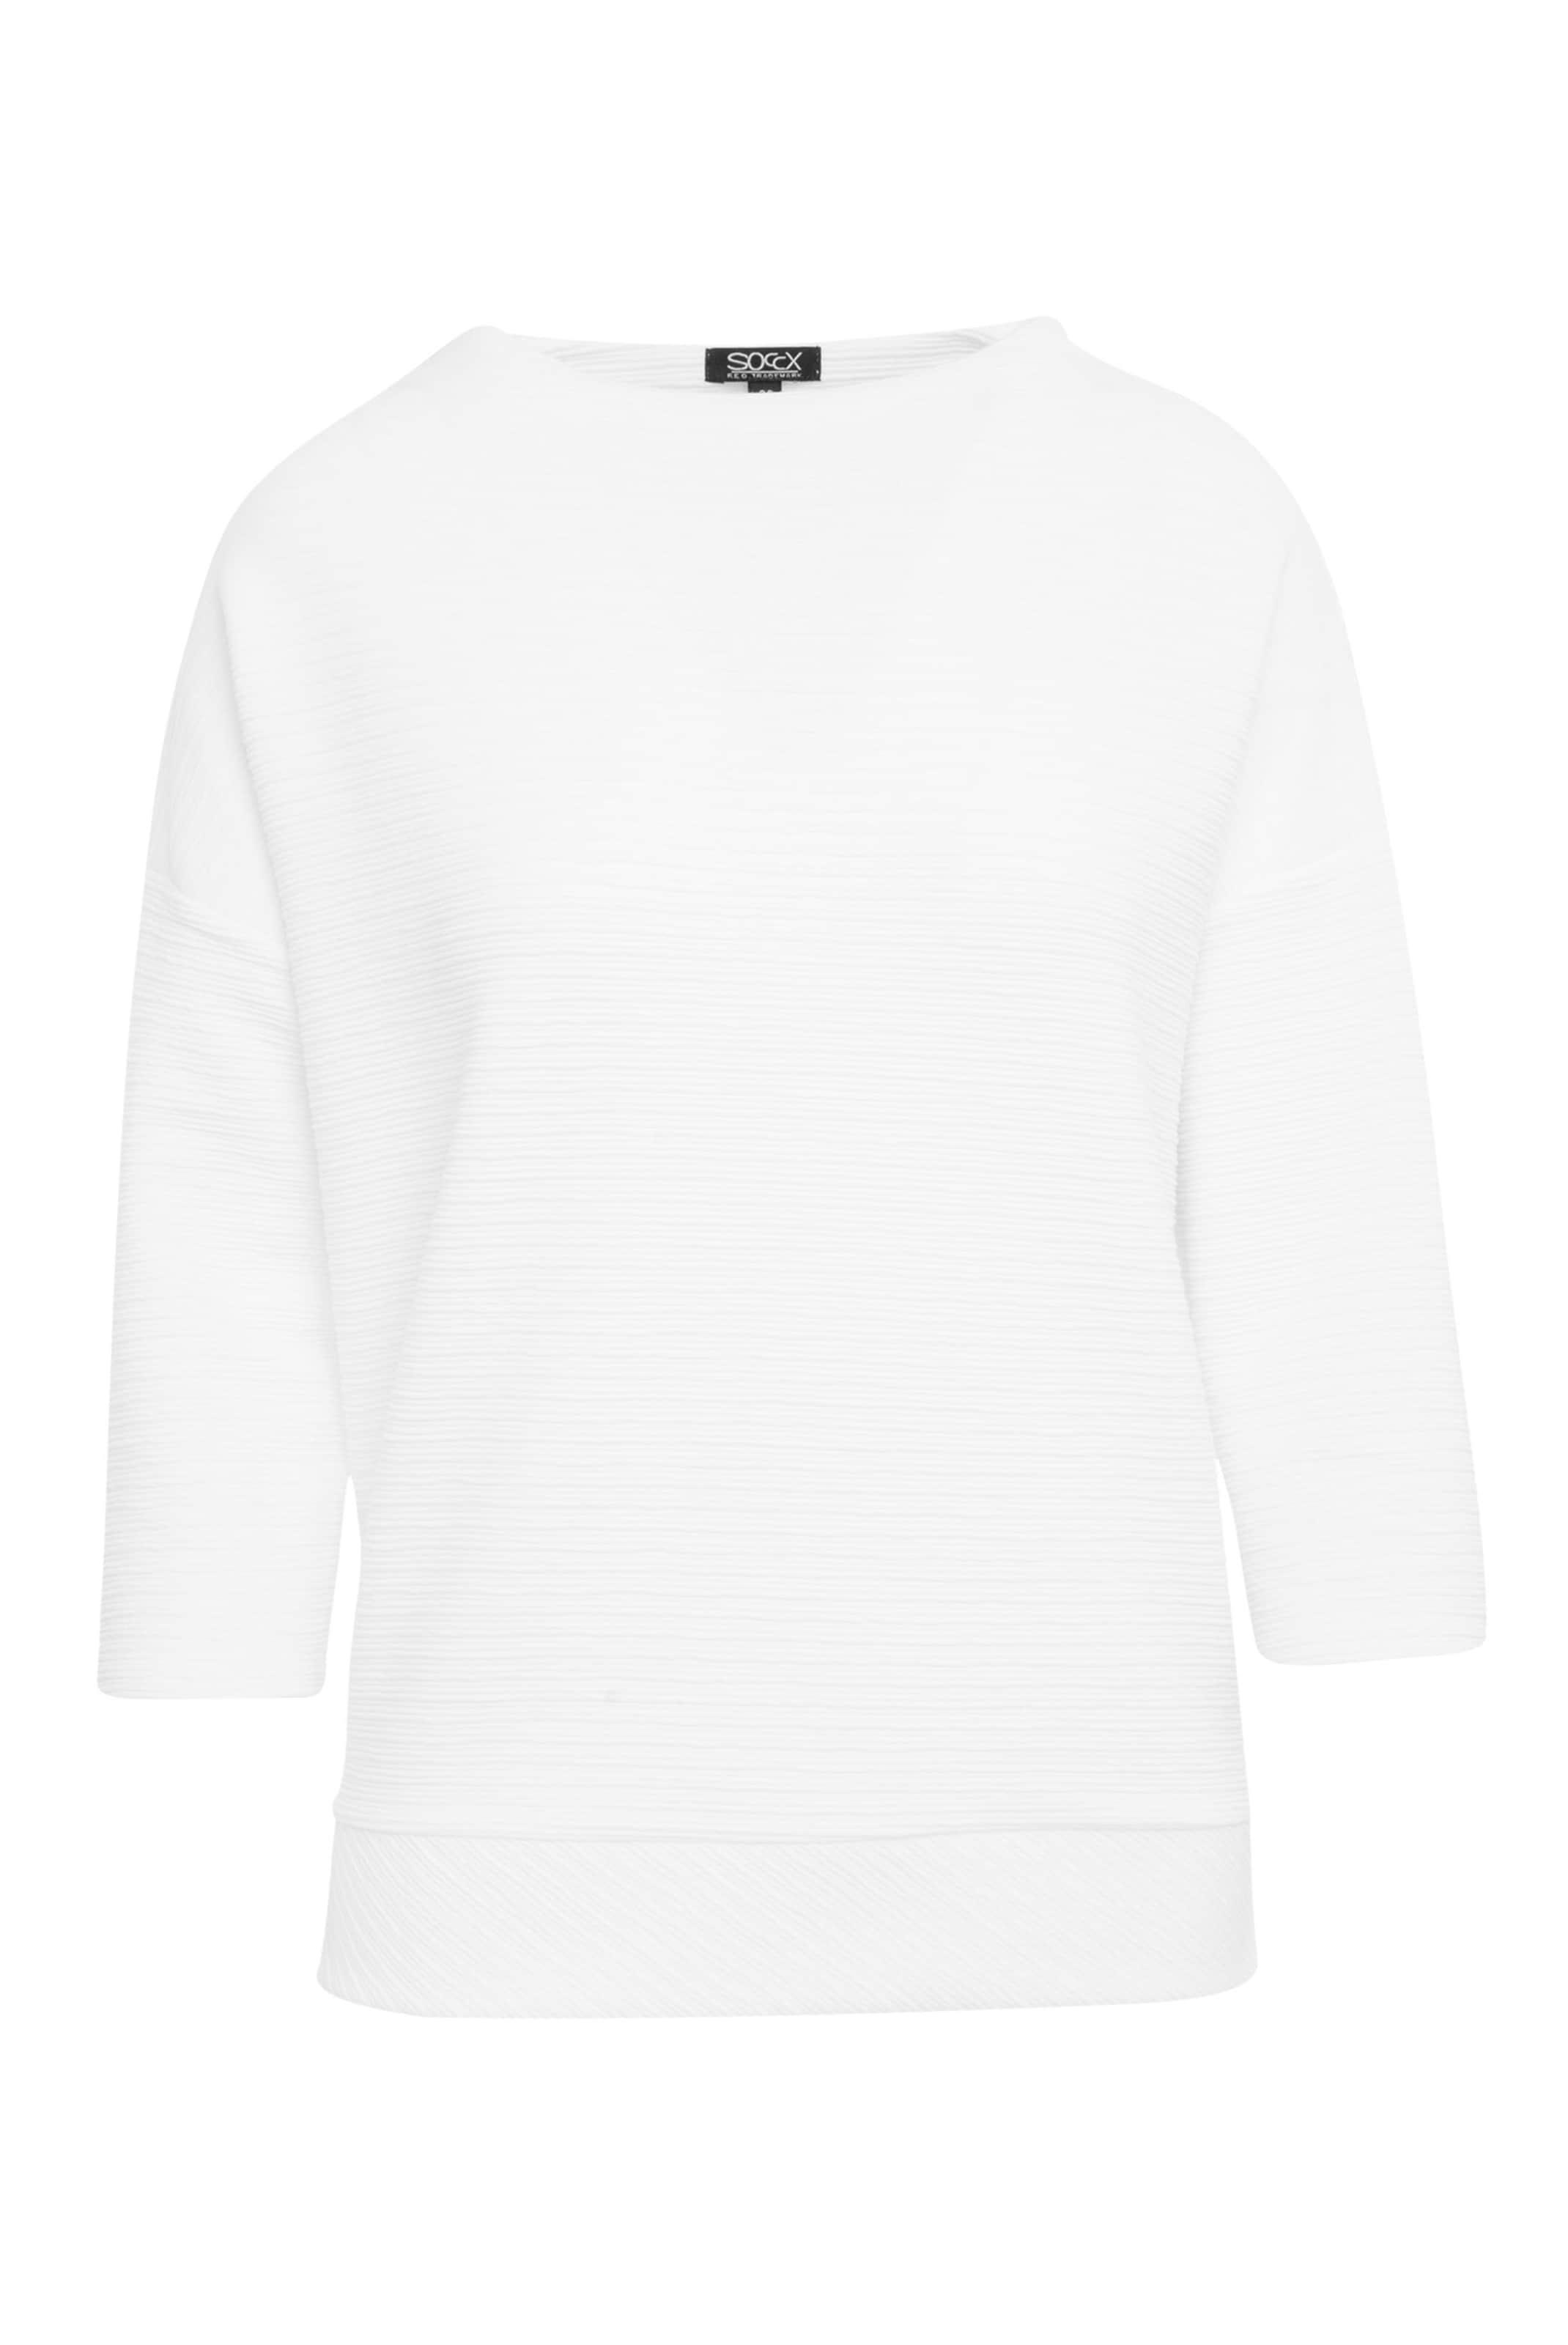 Weiß Soccx Shirt In Shirt Soccx nPk80wO